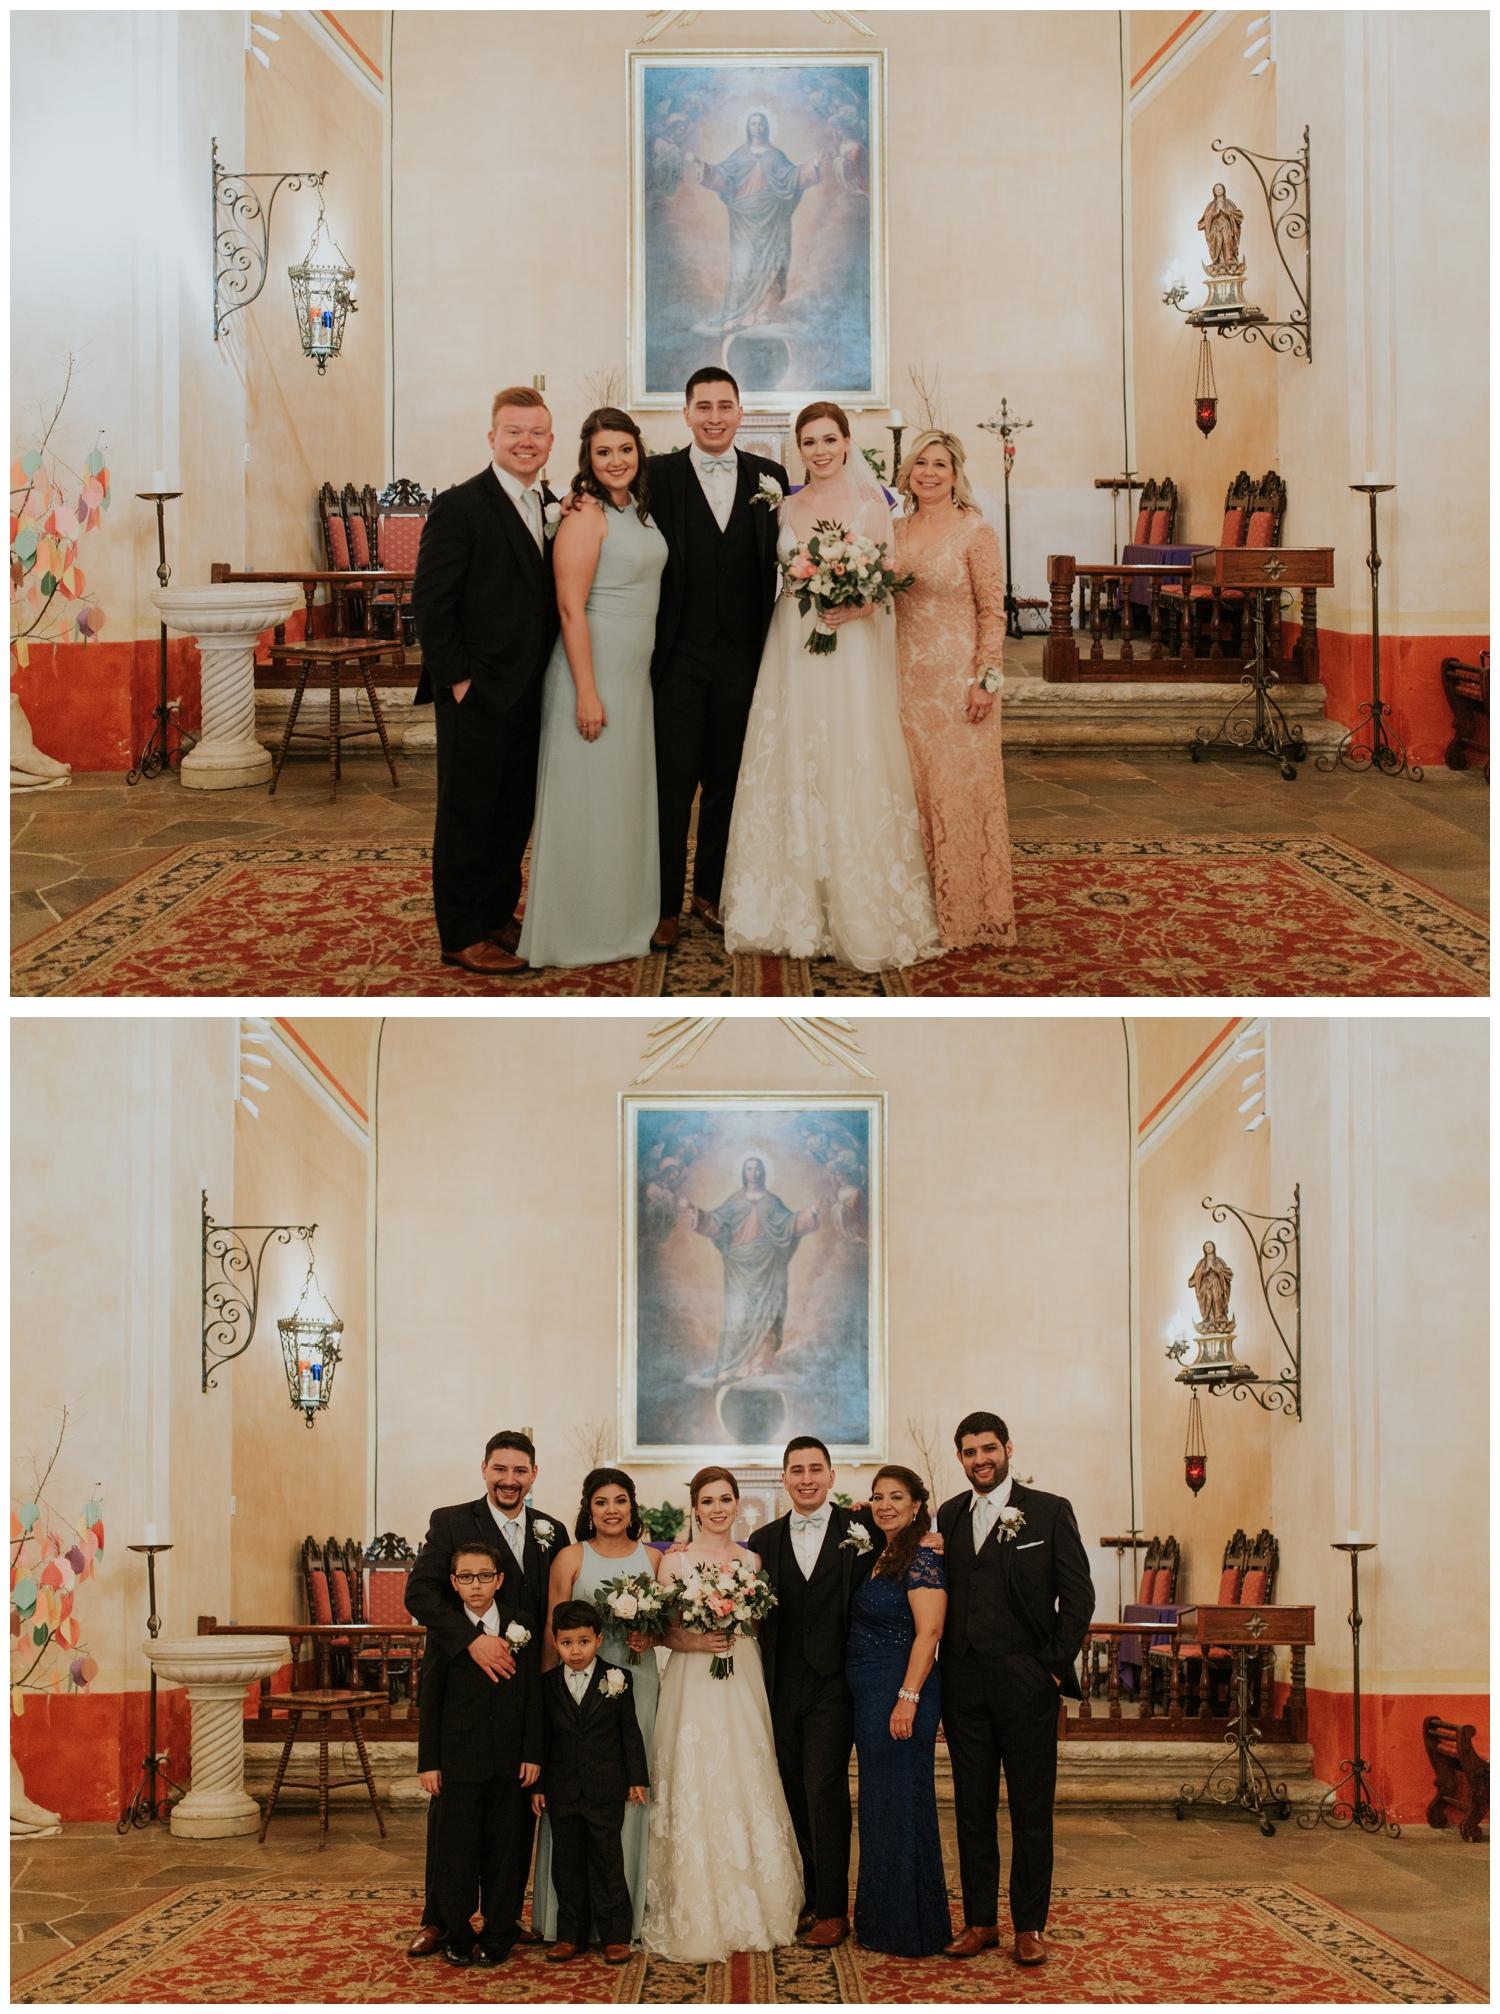 Jenna+Brandon, Mission Concepcion Wedding, San Antonio, Contista Productions Wedding Photography_0066.jpg